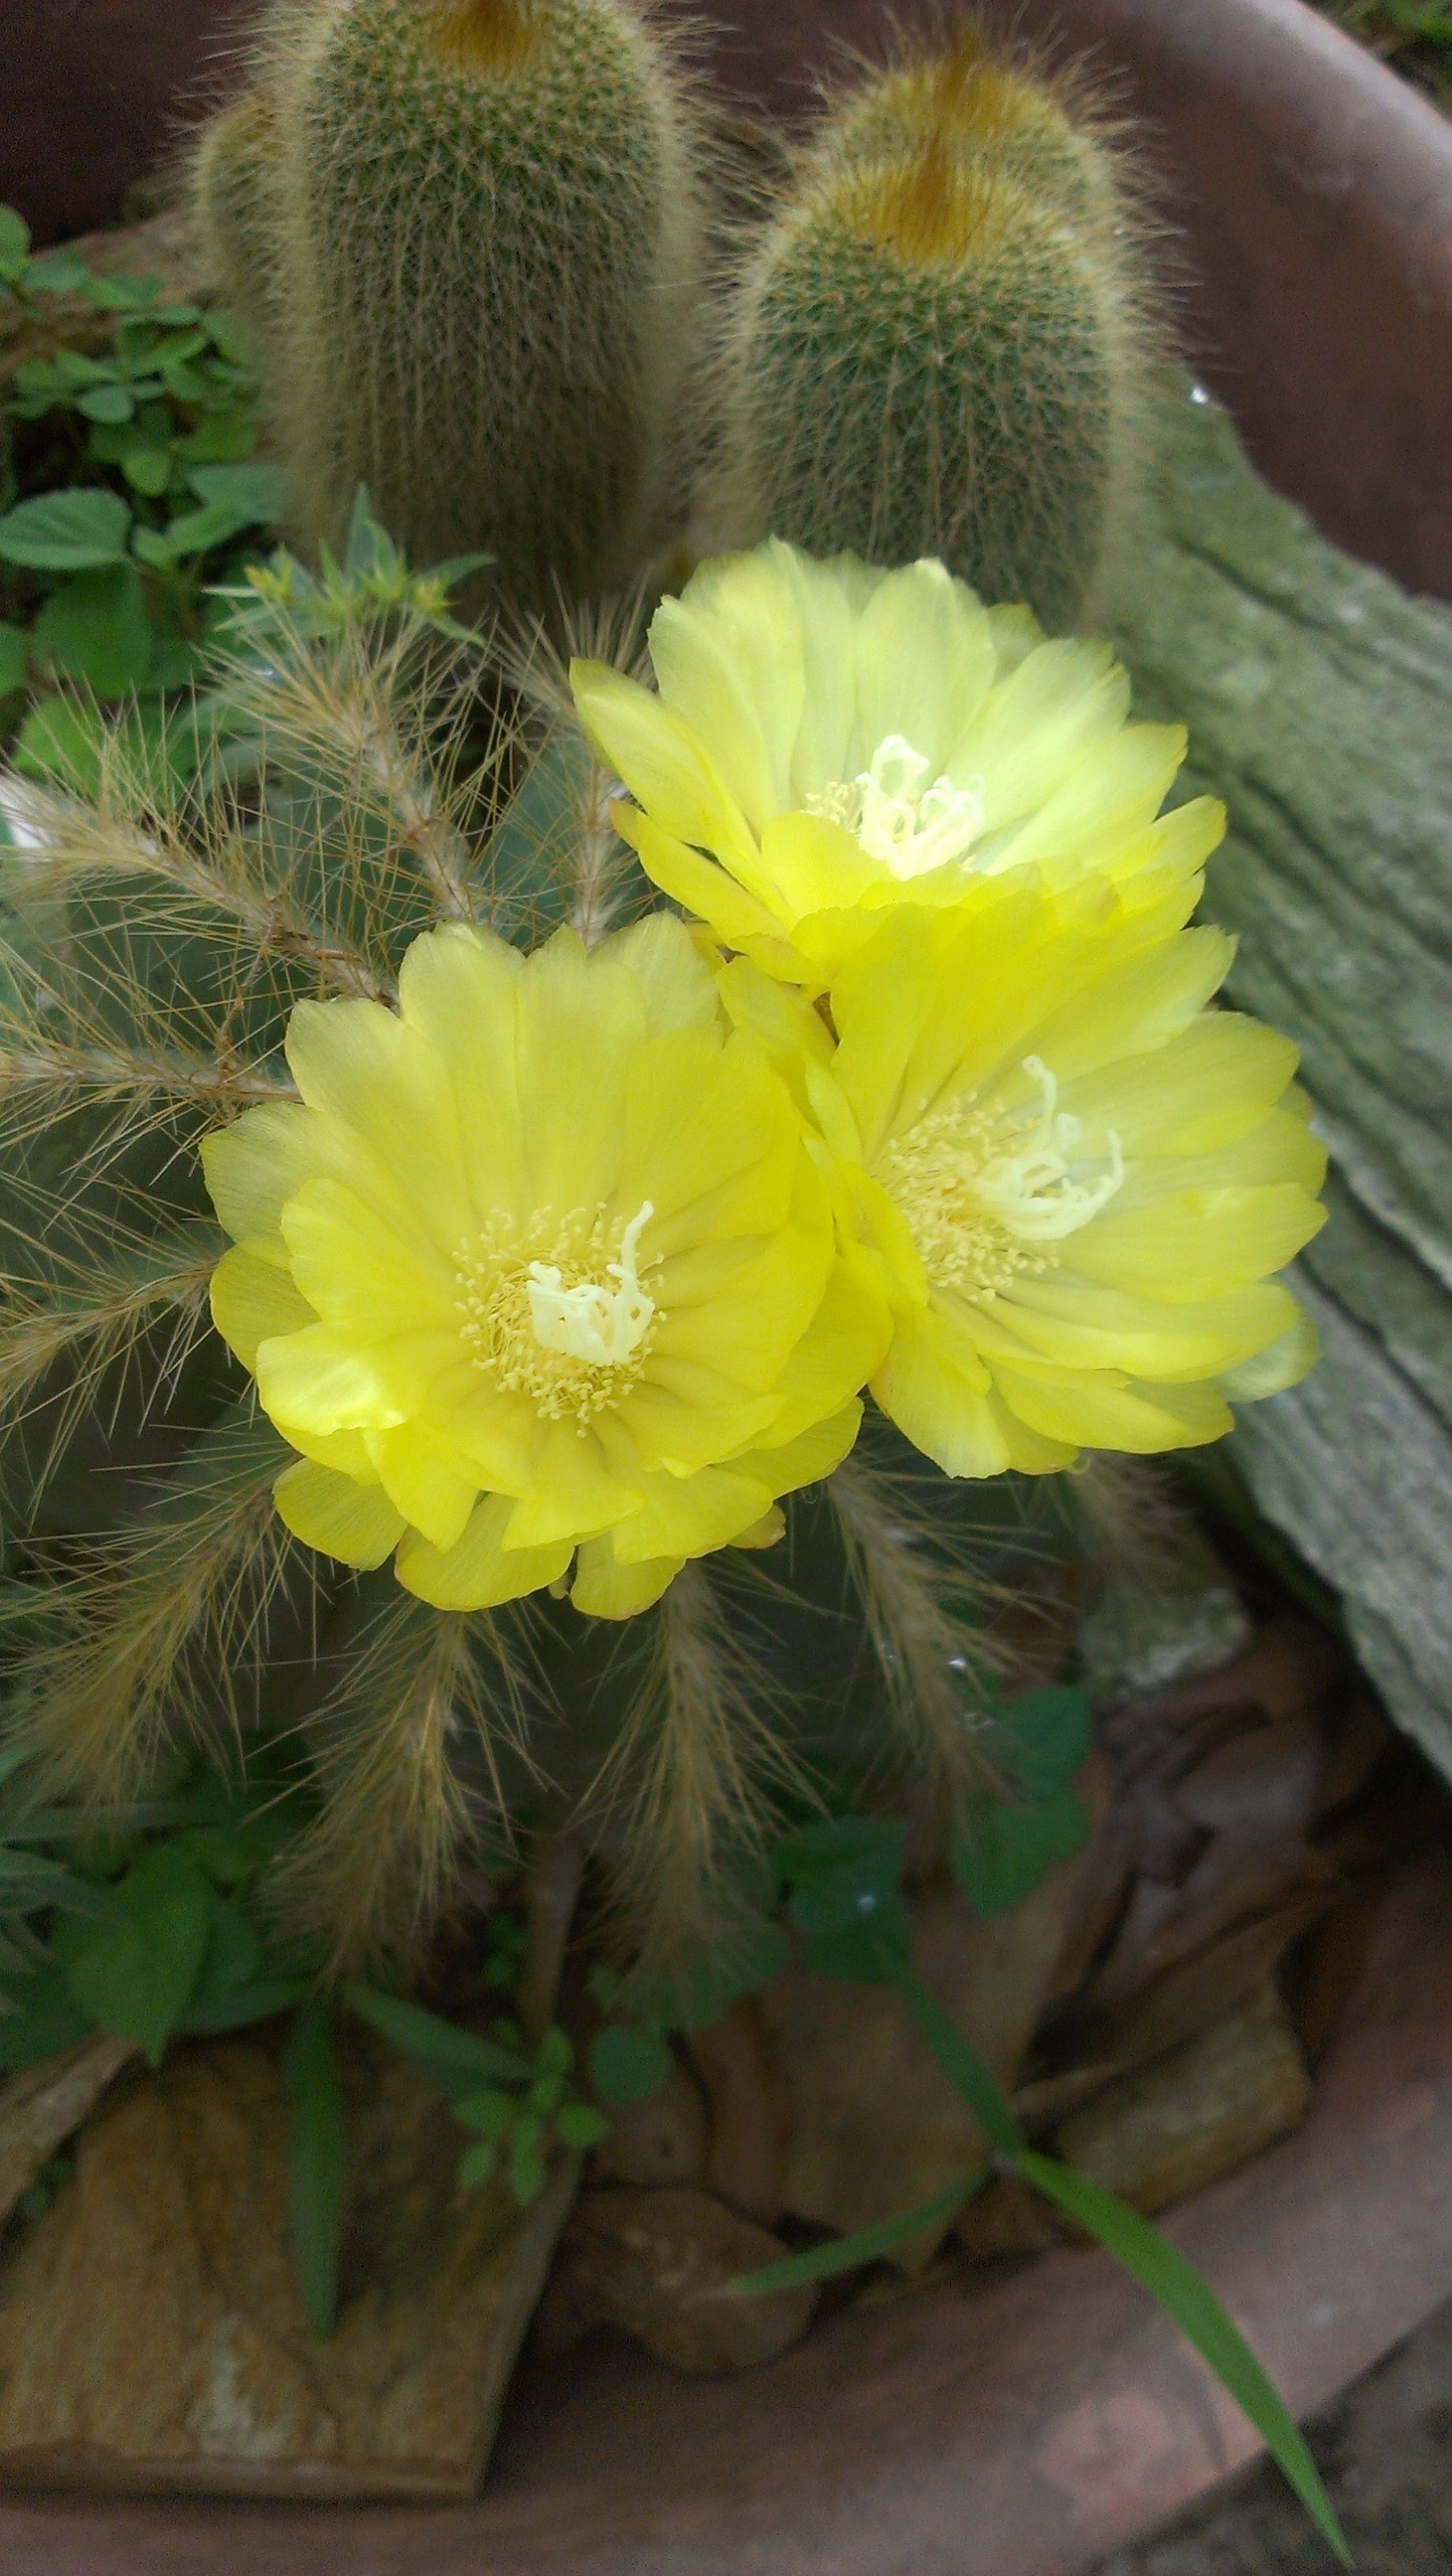 Yellow Cactus Flower Flowers Pinterest Cactus Flower Cacti